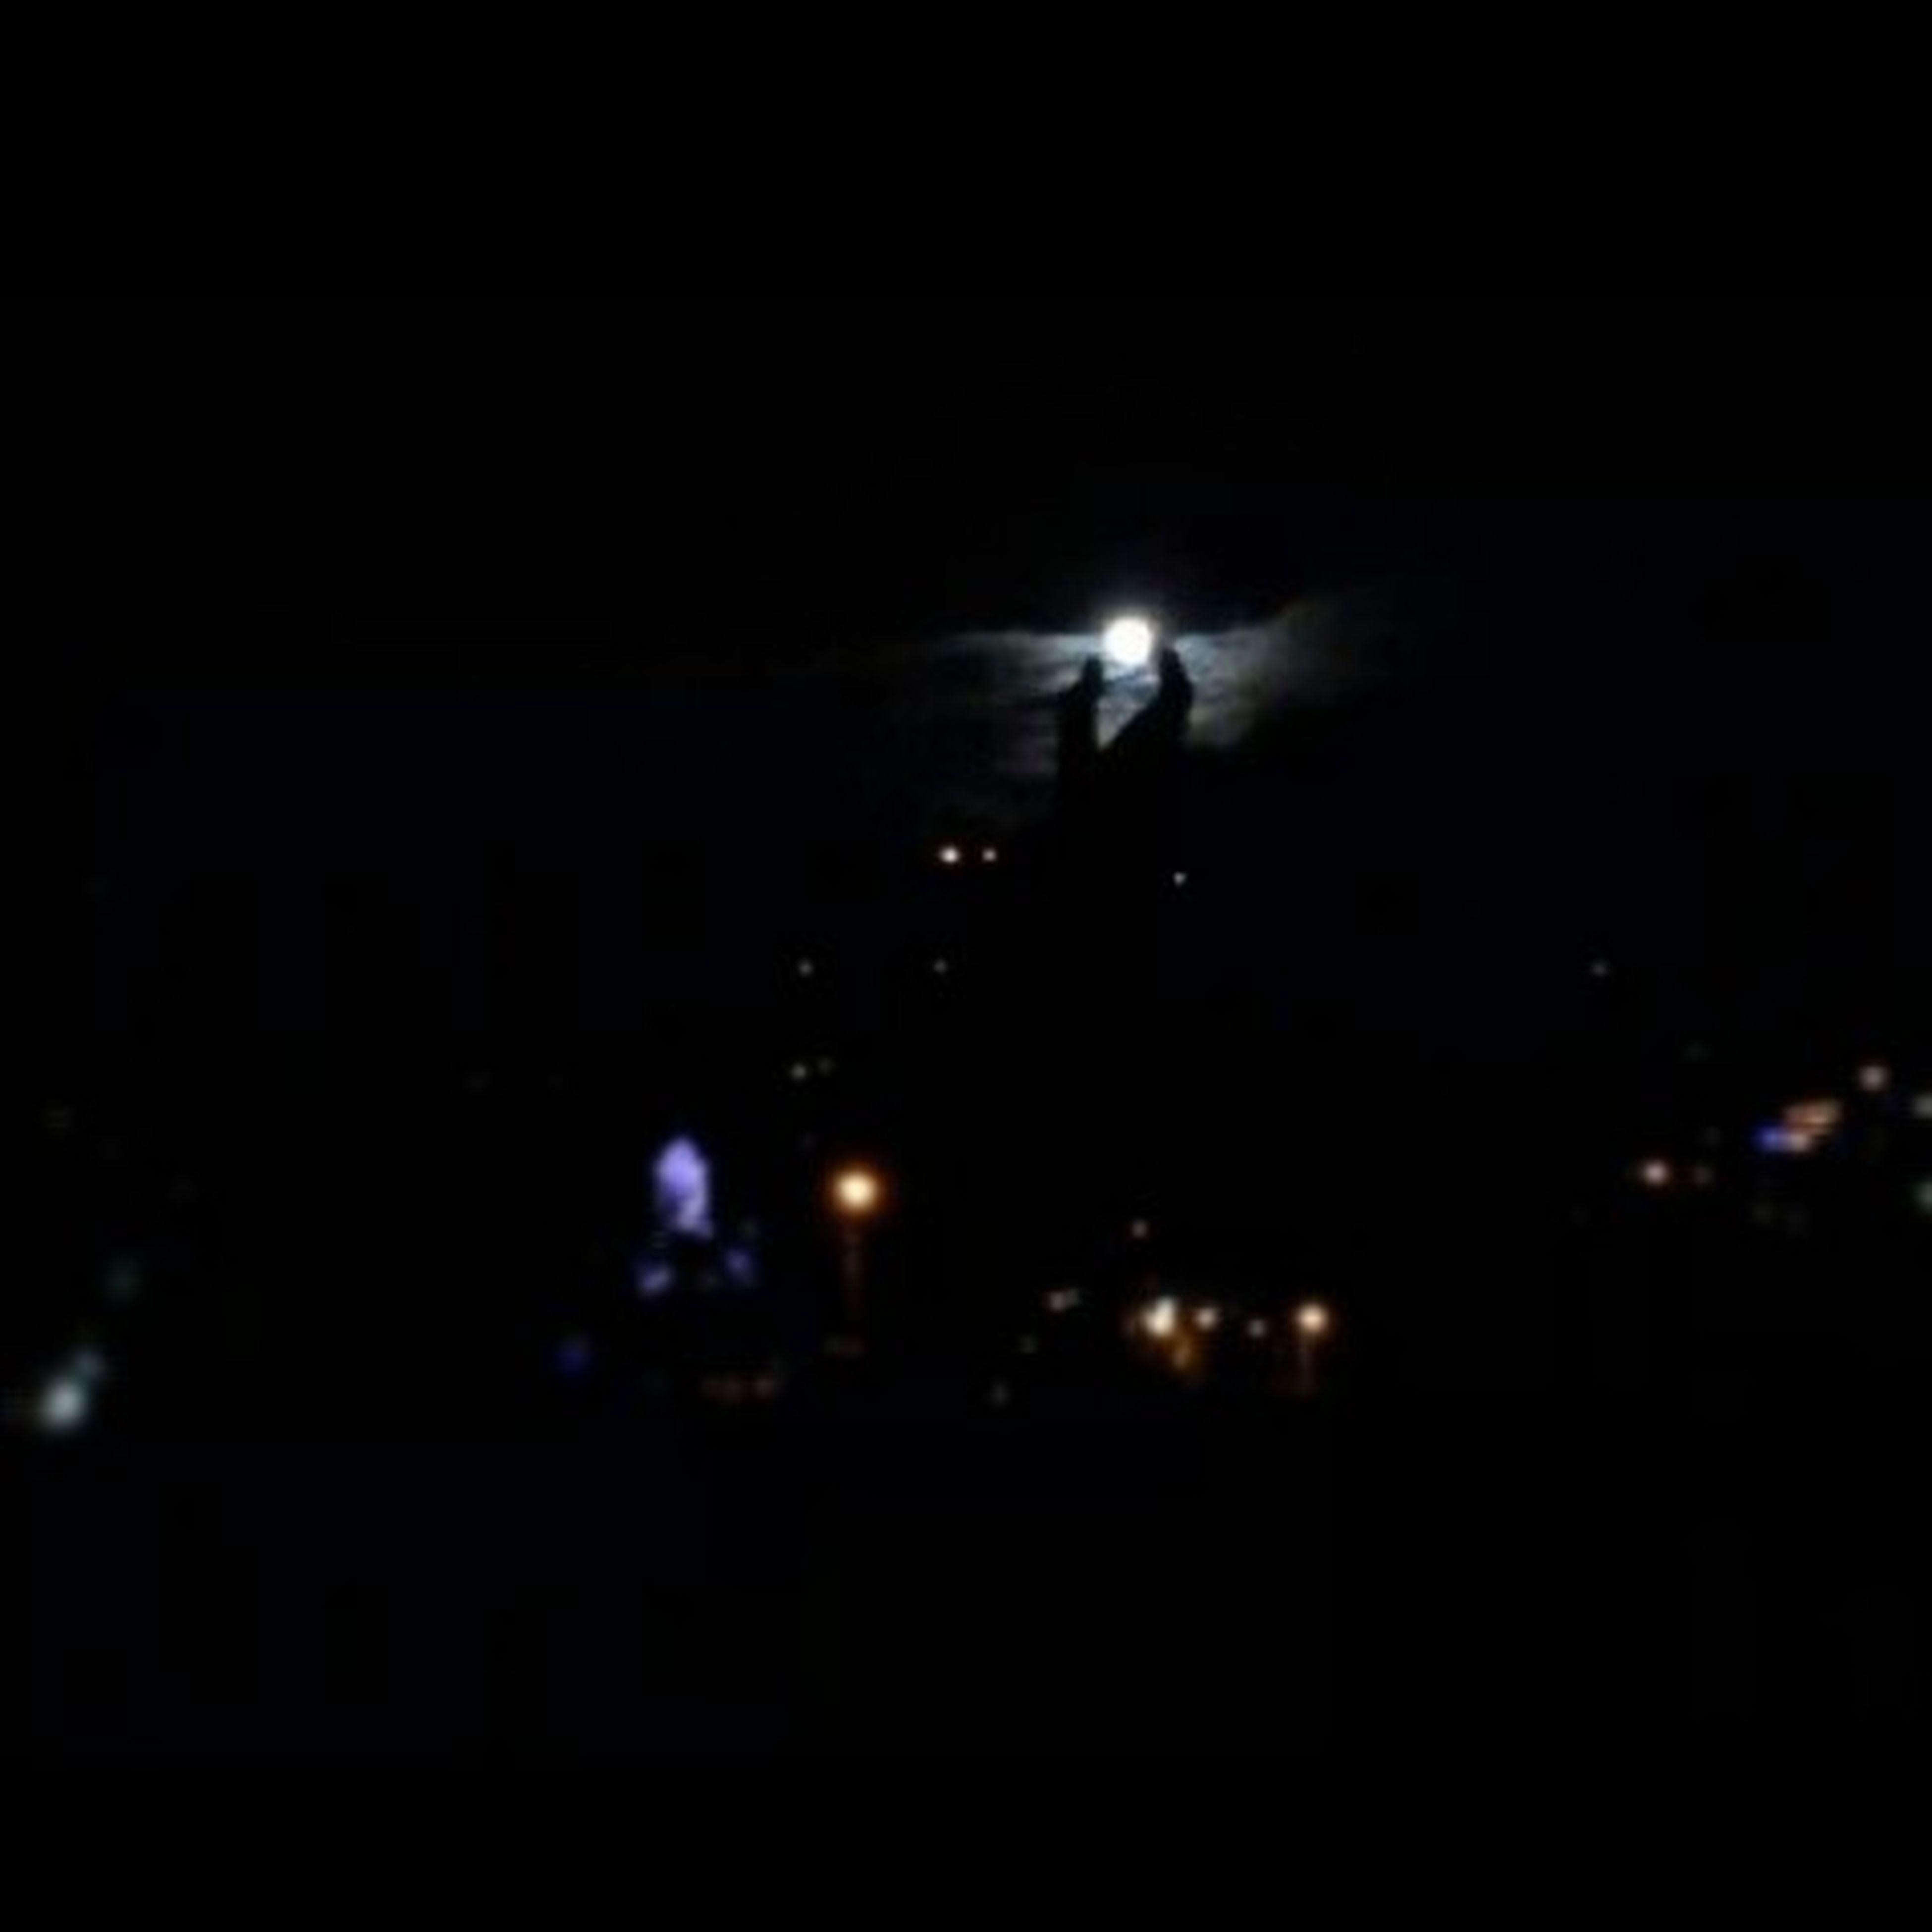 night, illuminated, dark, lighting equipment, light - natural phenomenon, copy space, glowing, defocused, light, sky, indoors, moon, silhouette, no people, low angle view, darkroom, street light, lit, black background